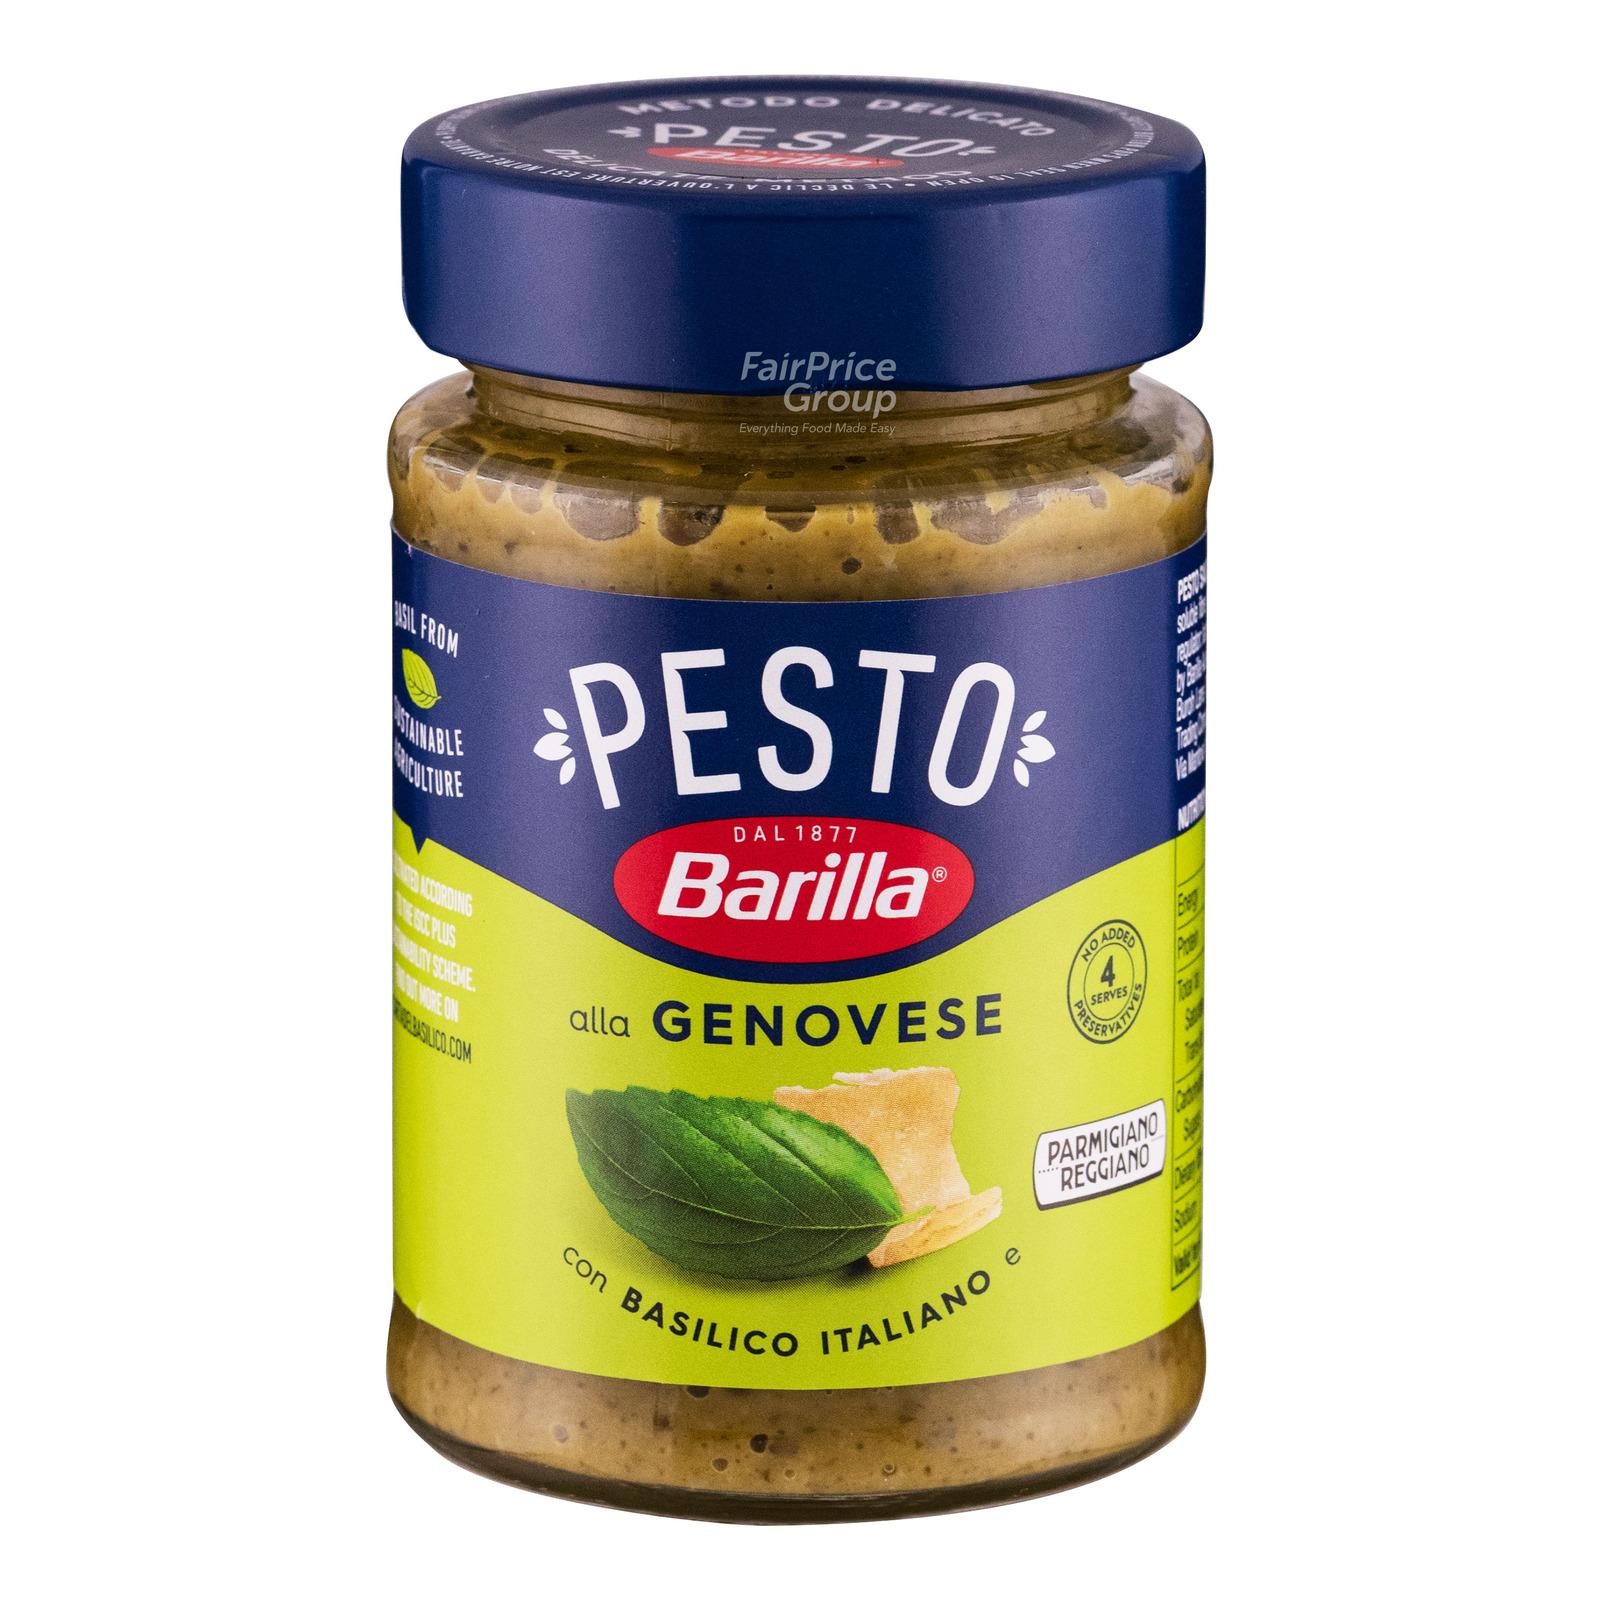 Barilla Pasta Sauce Pesto Genovese Ntuc Fairprice